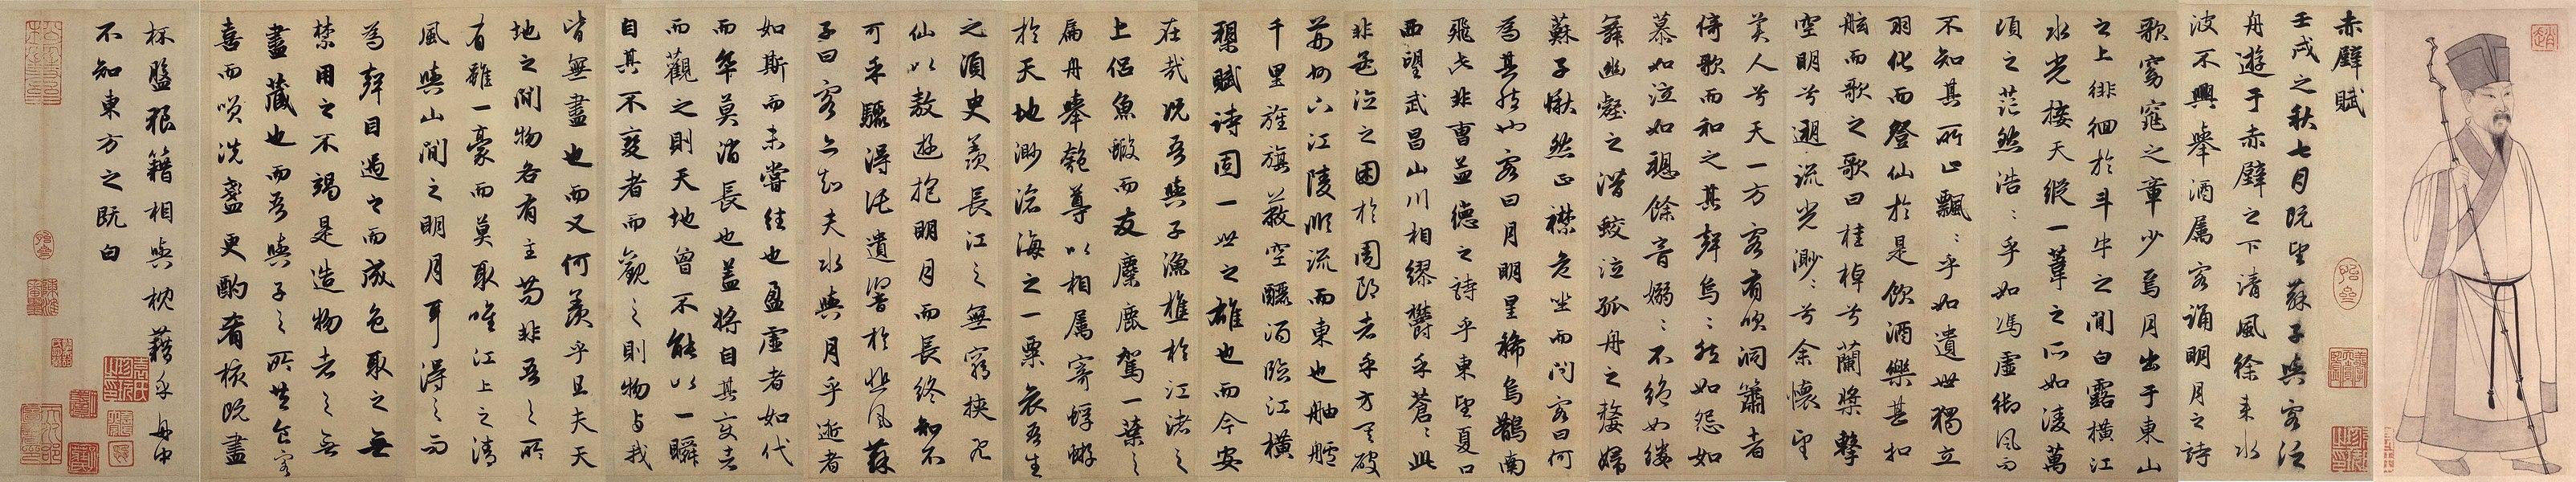 zhao mengfu - image 3